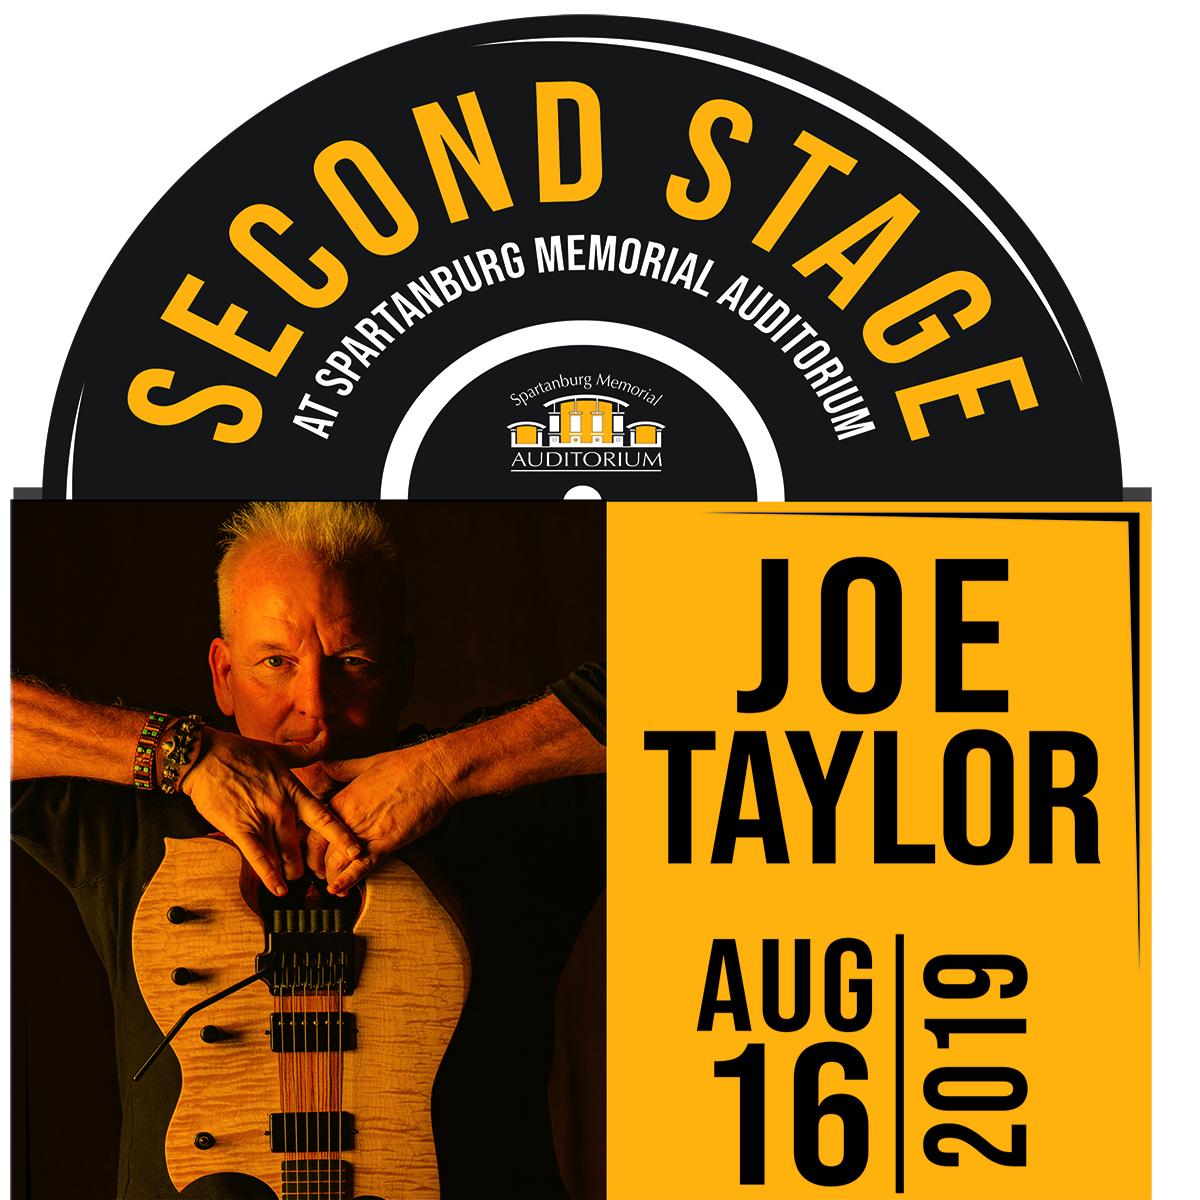 Joe Taylor @ Second Stage SMA